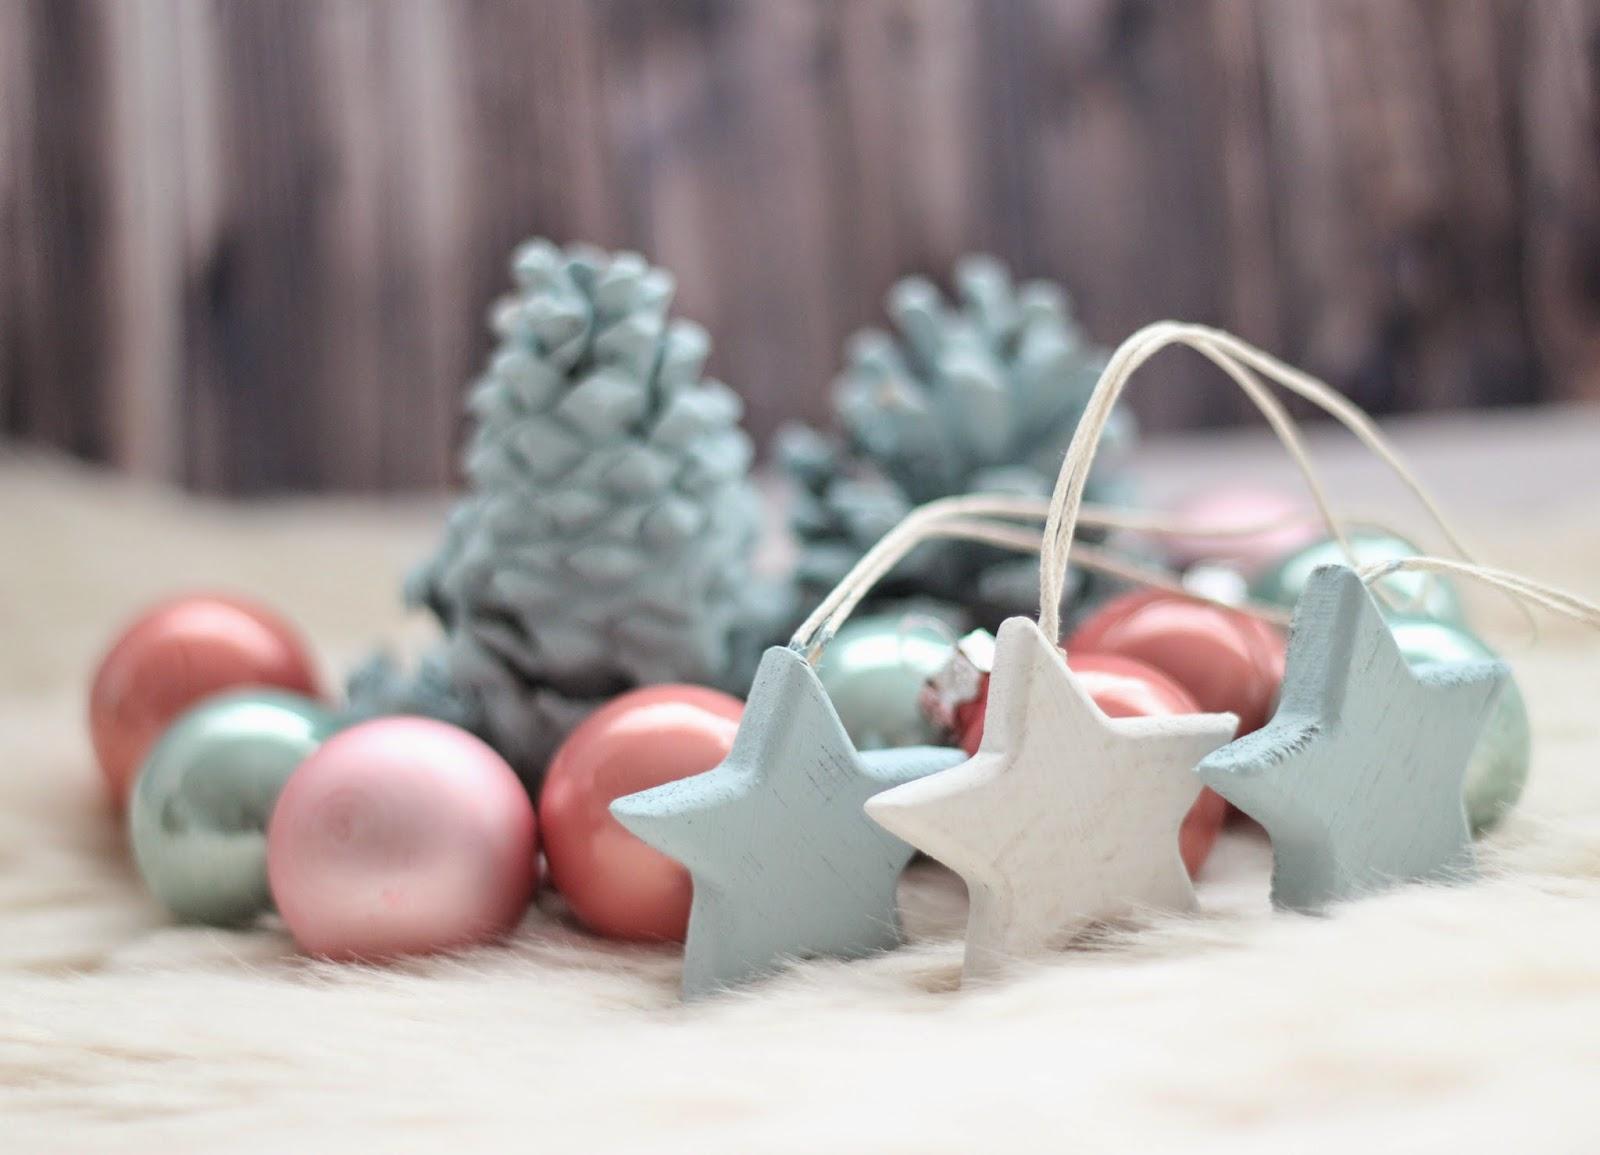 photo-deco-navidad-bolas-piñas_chalkpaint-estrellas-Sostrene-Grene